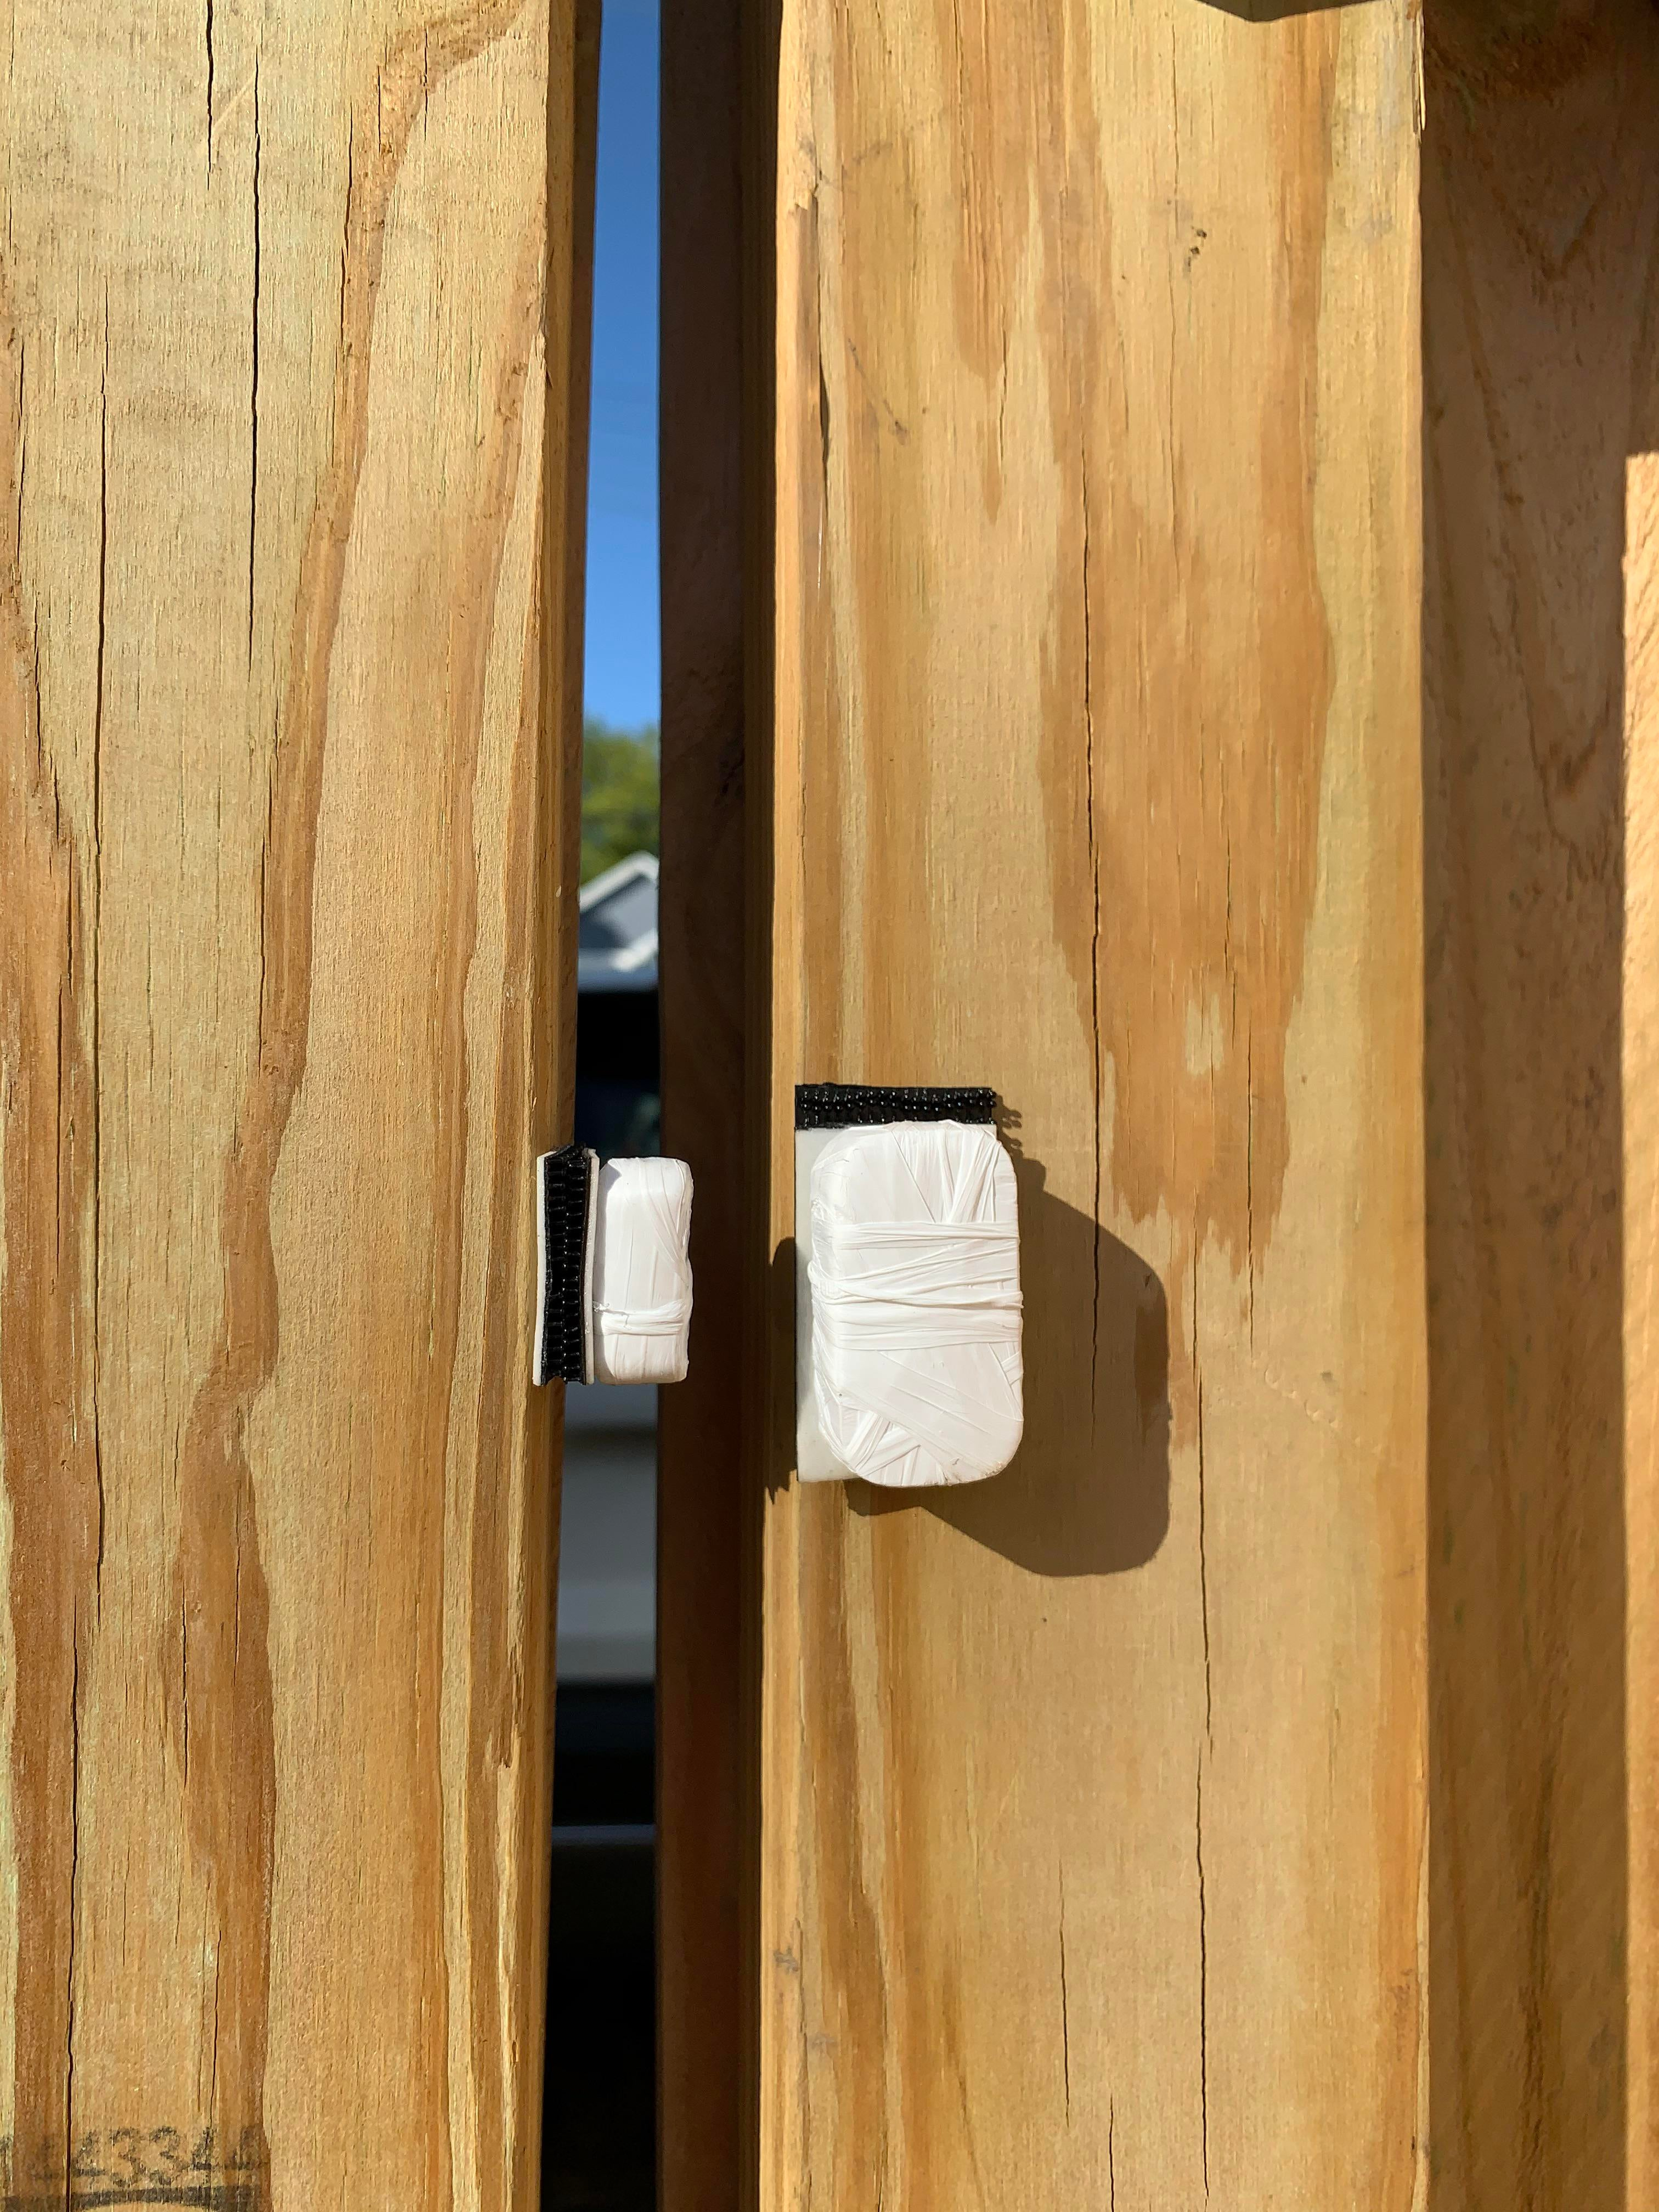 I weathered my Aqara sensor to function as a gate